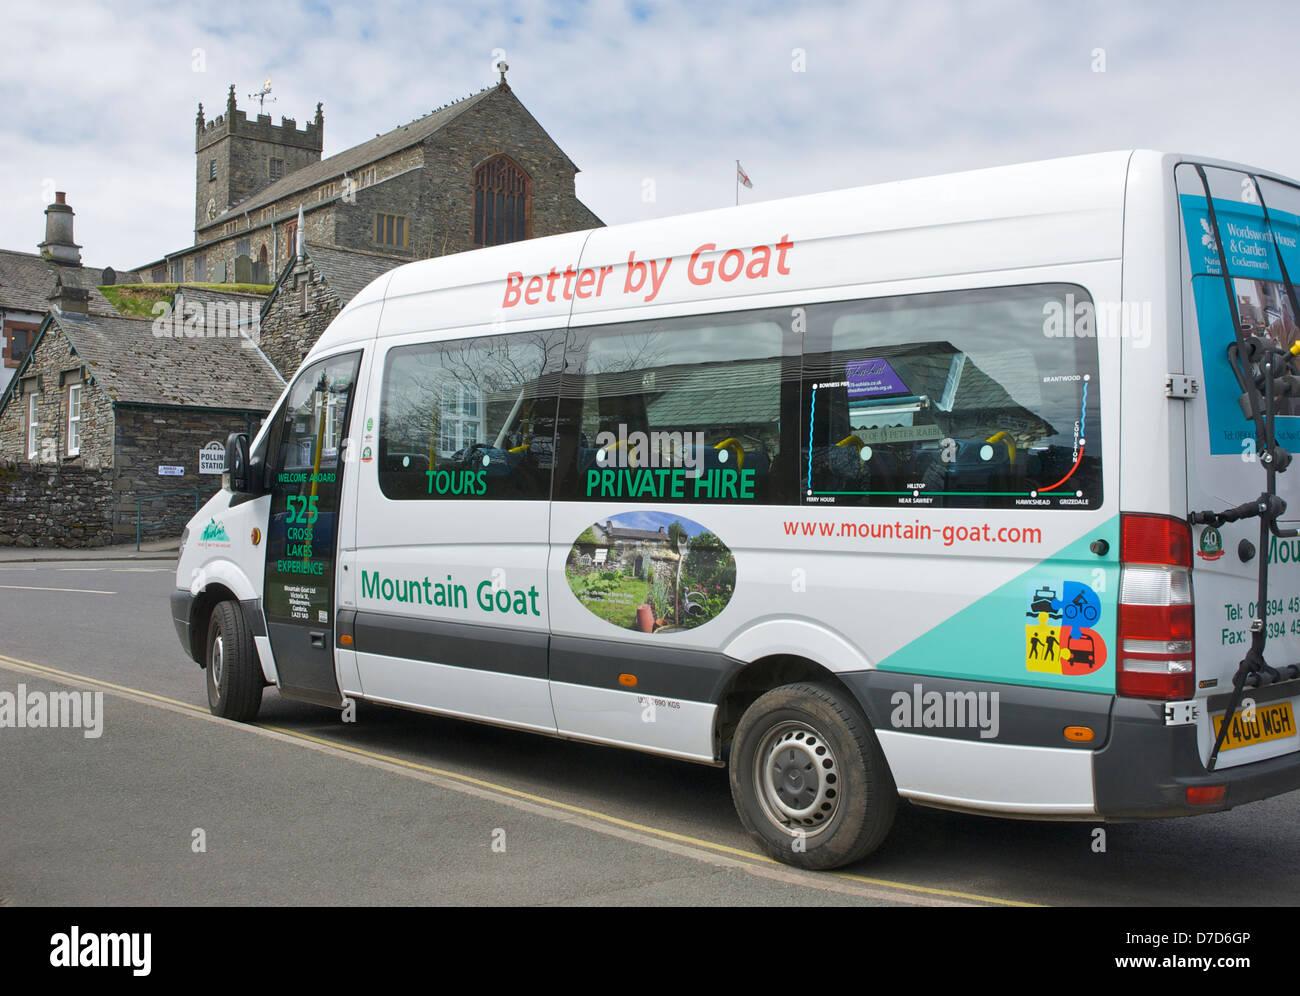 Mountain Goat minibus parked in Hawkshead village, Lake District National Park, Cumbria, England UK - Stock Image